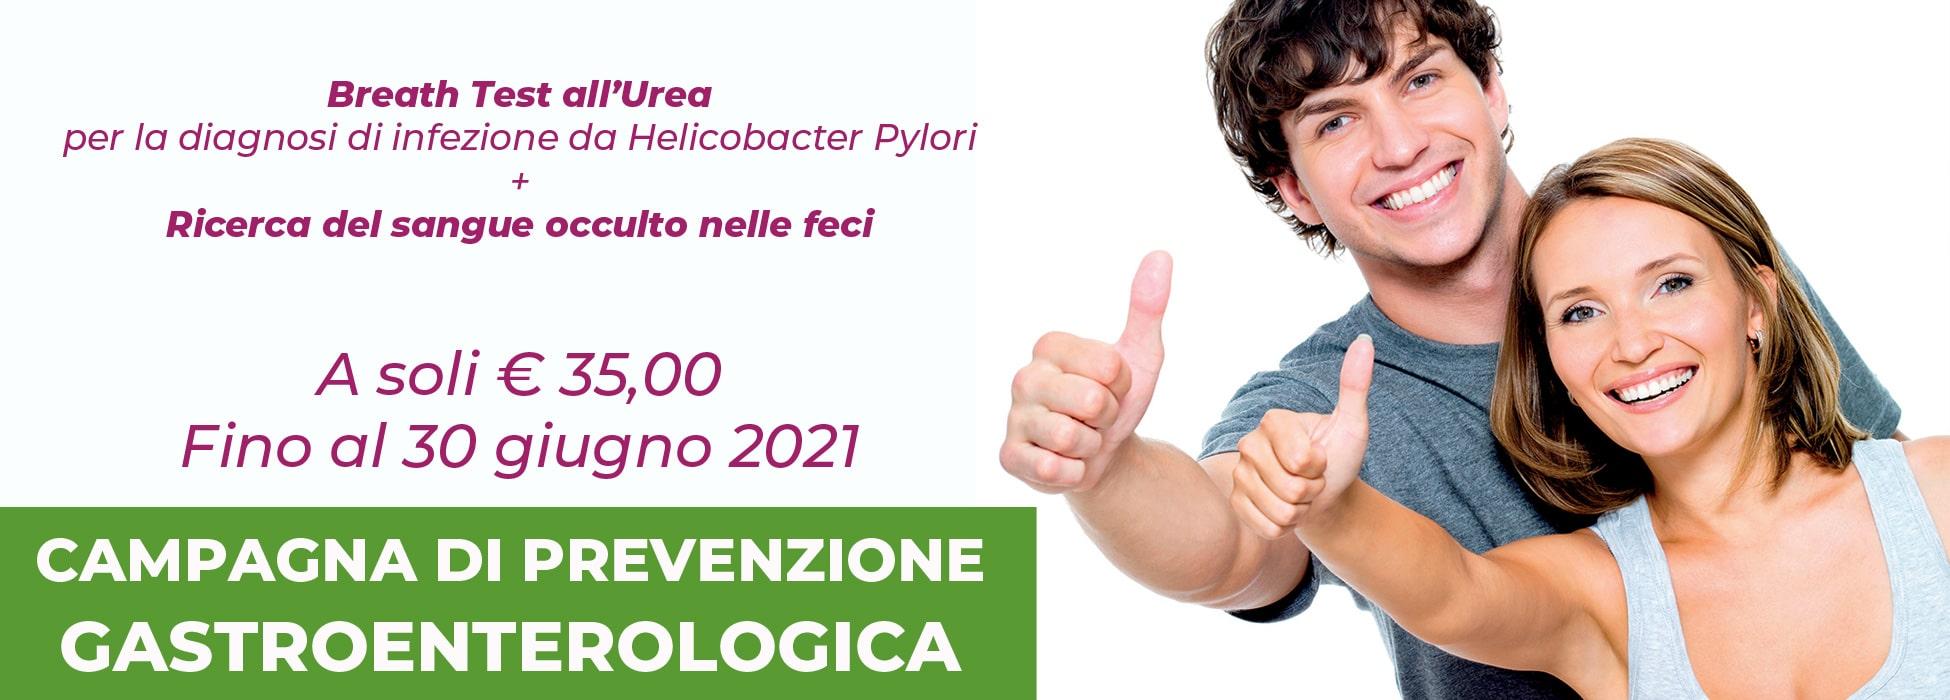 Campagna Gastroenterologica